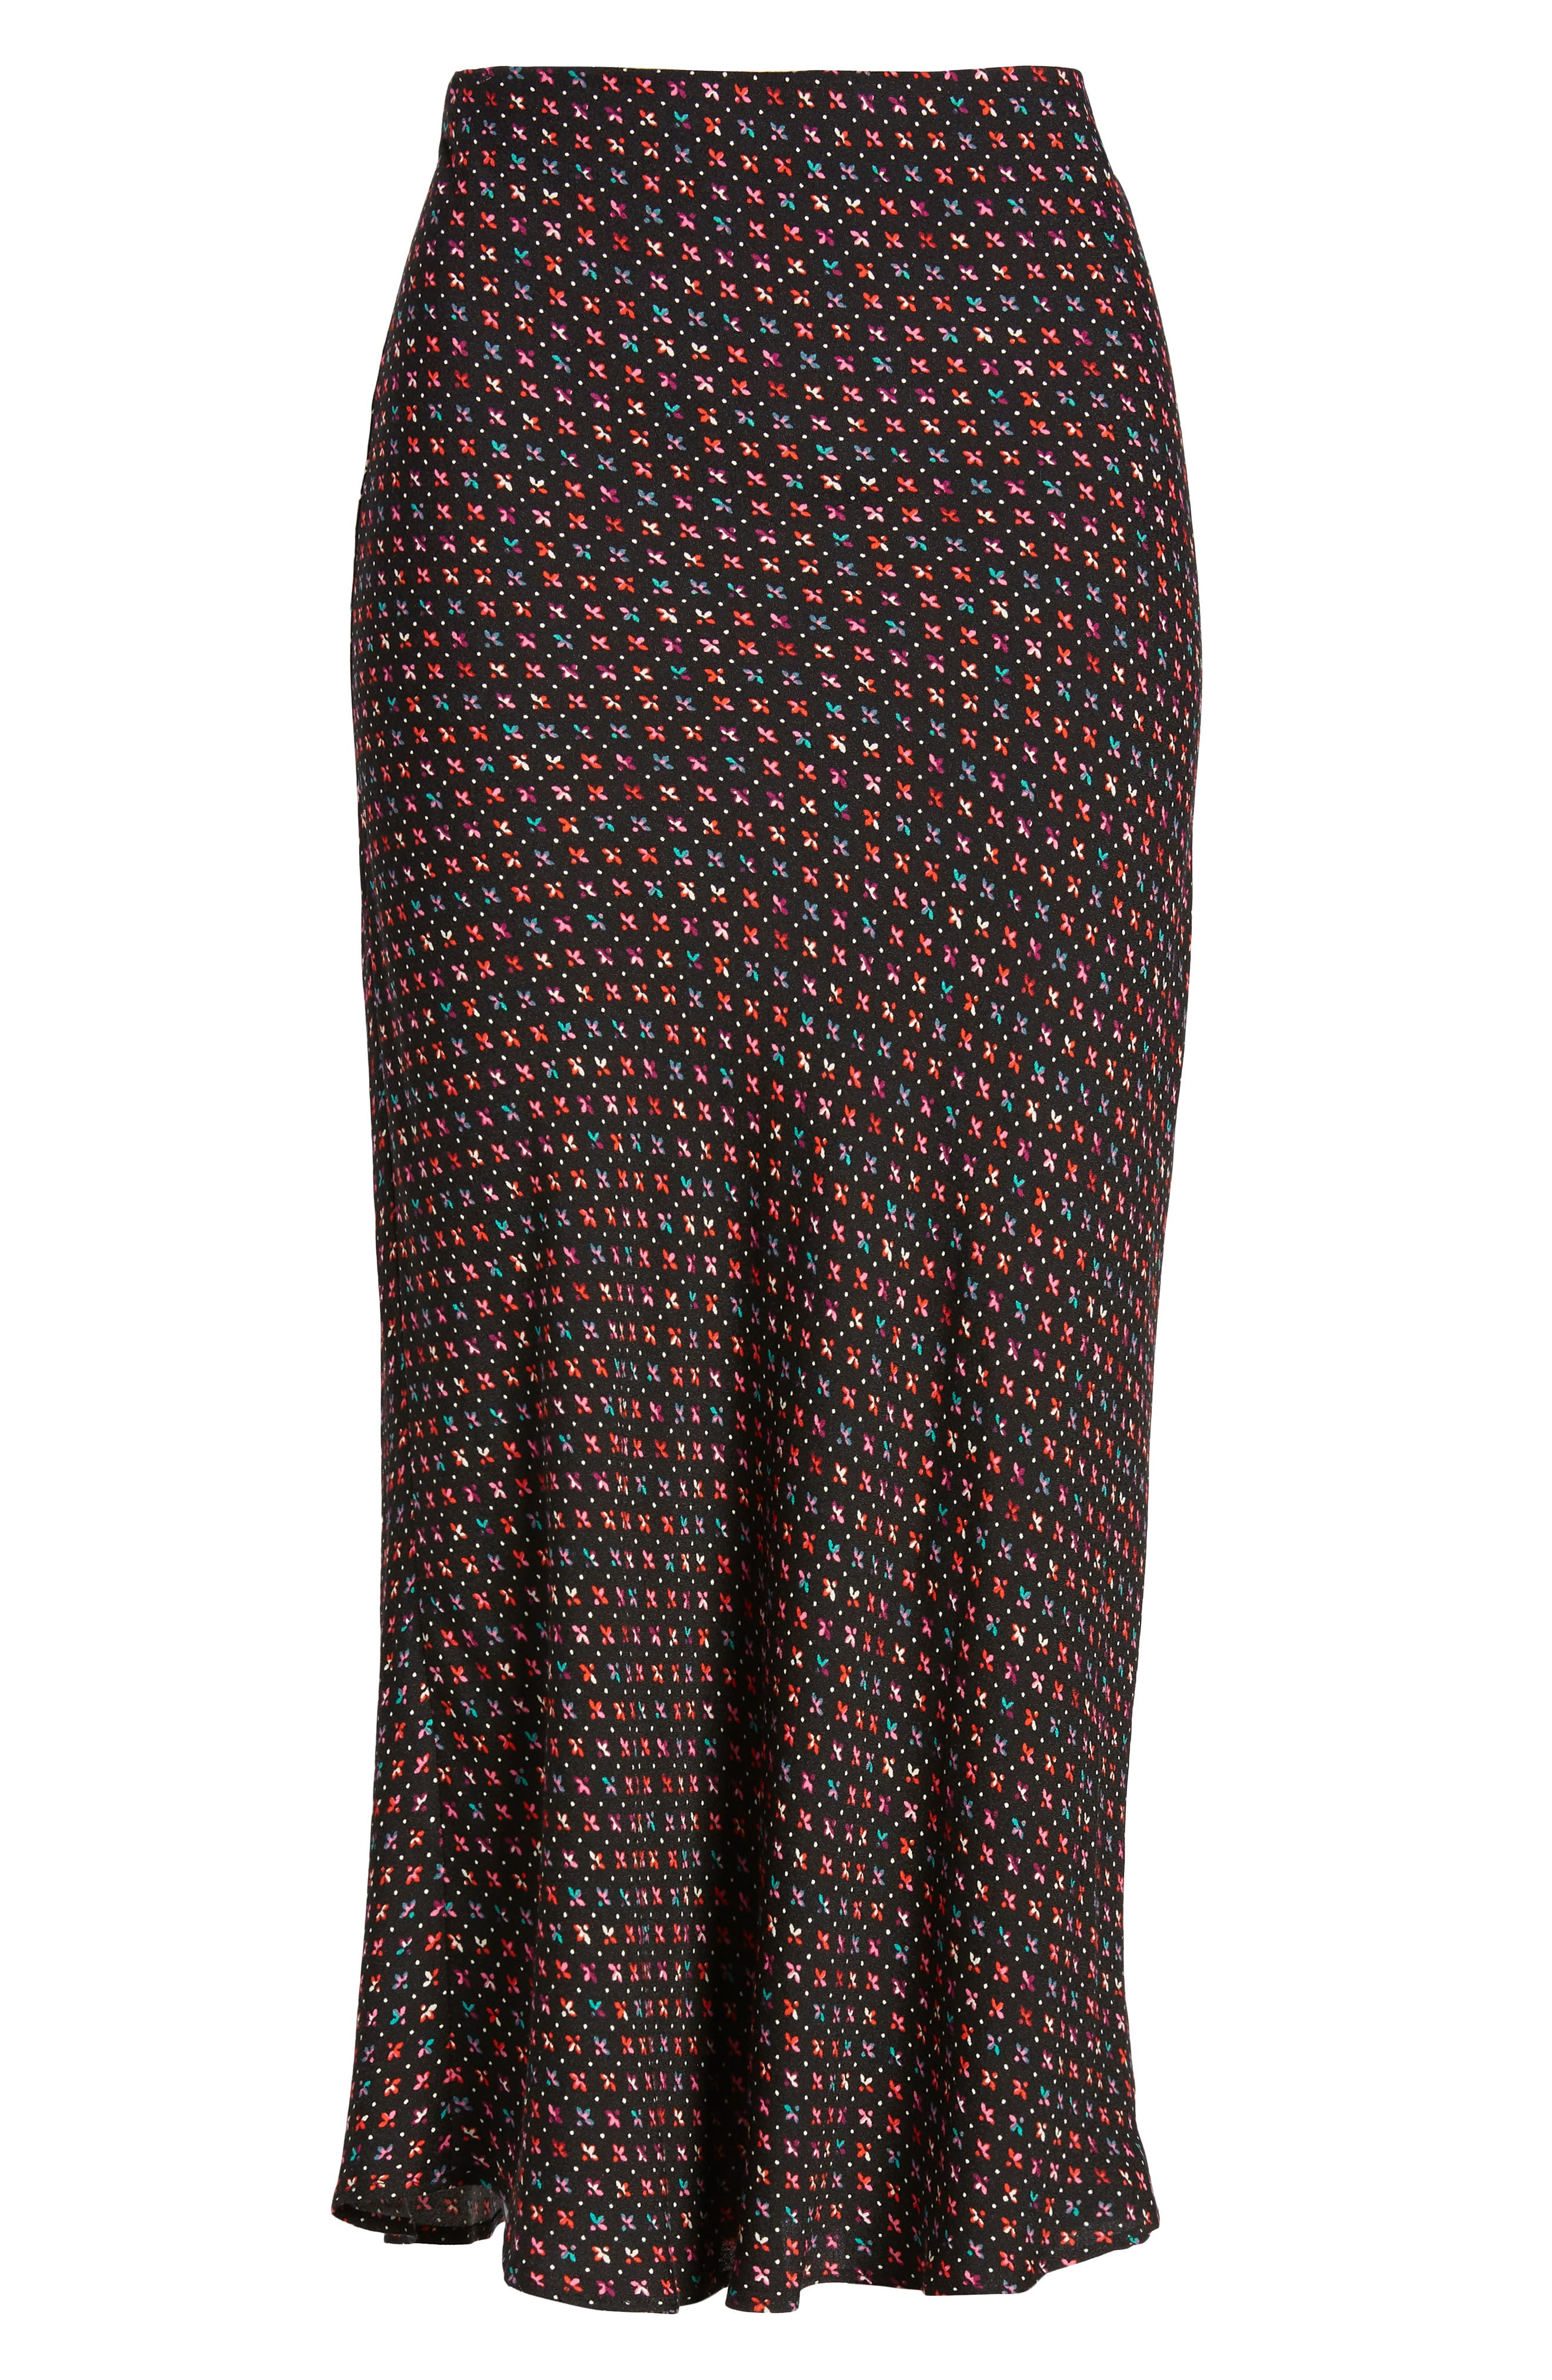 AFRM, Brynne Print Midi Skirt, Alternate thumbnail 6, color, 001